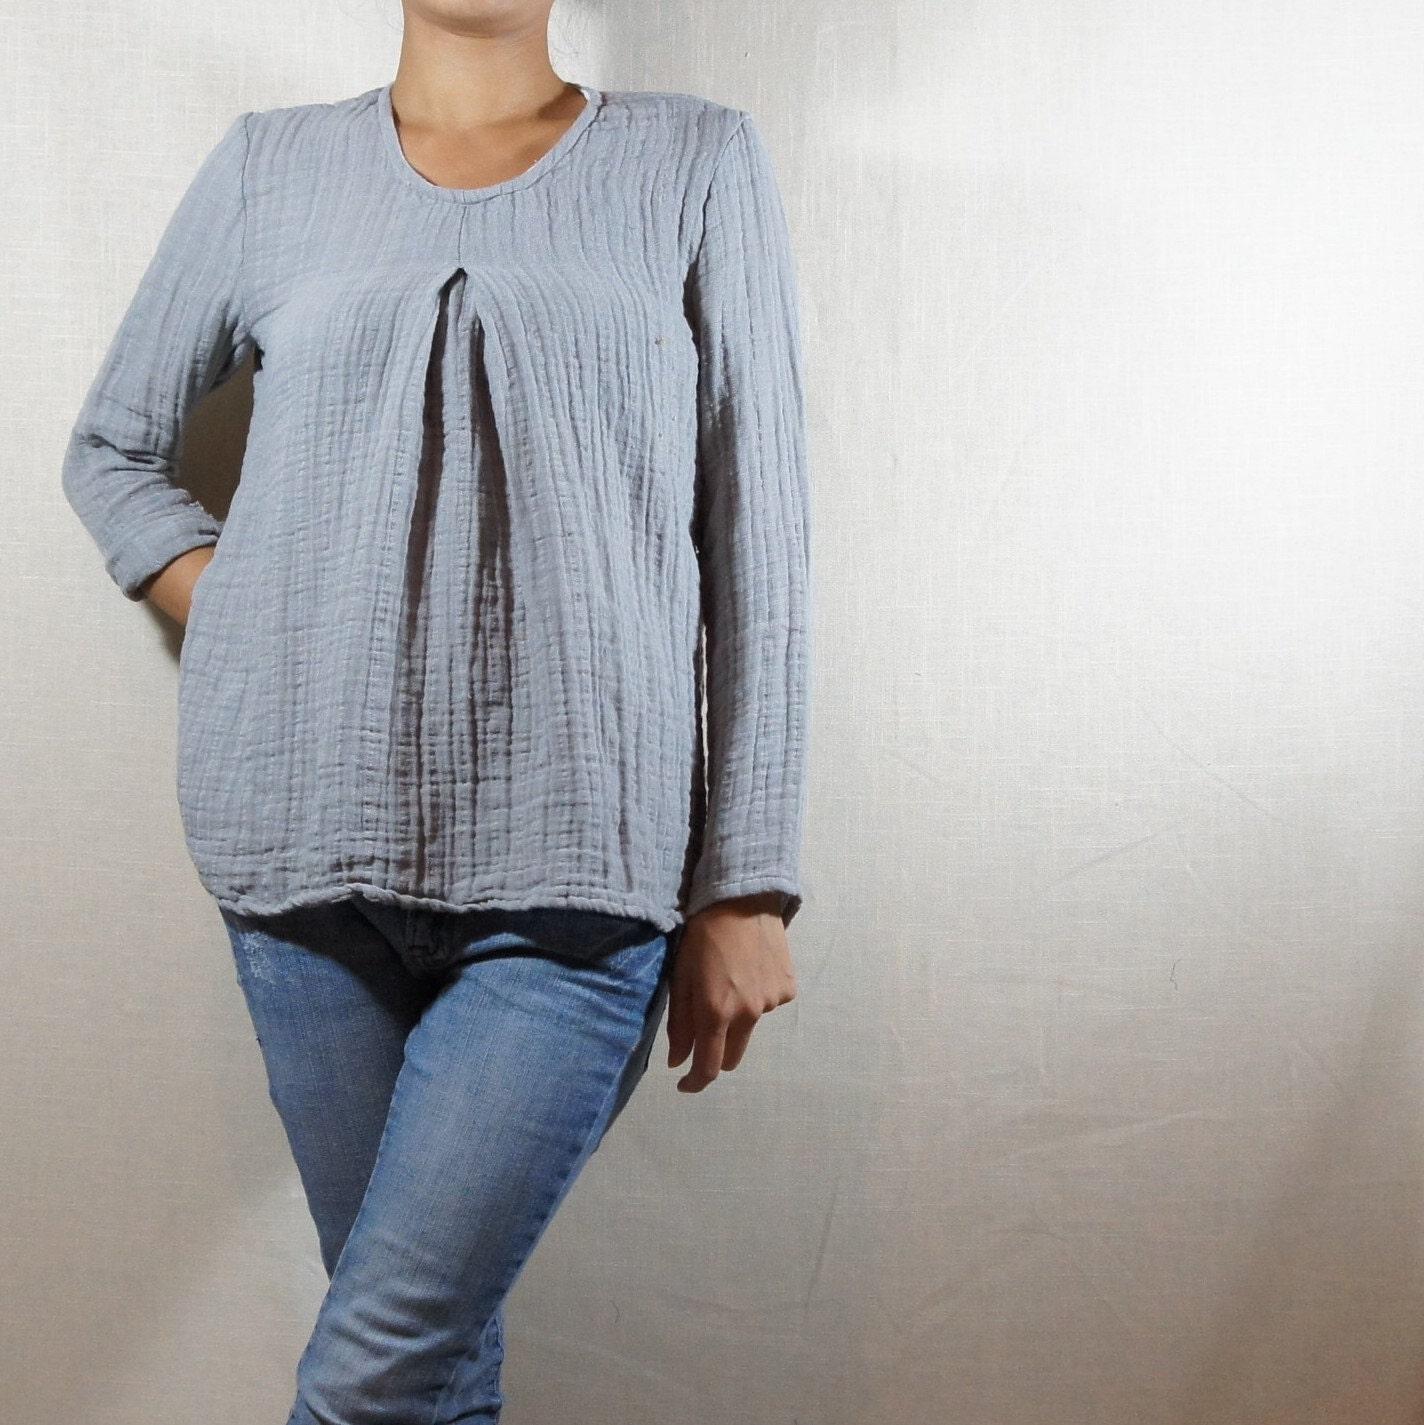 93b9243345f 100% double gauze muslin tunic   blouse  Textured cotton